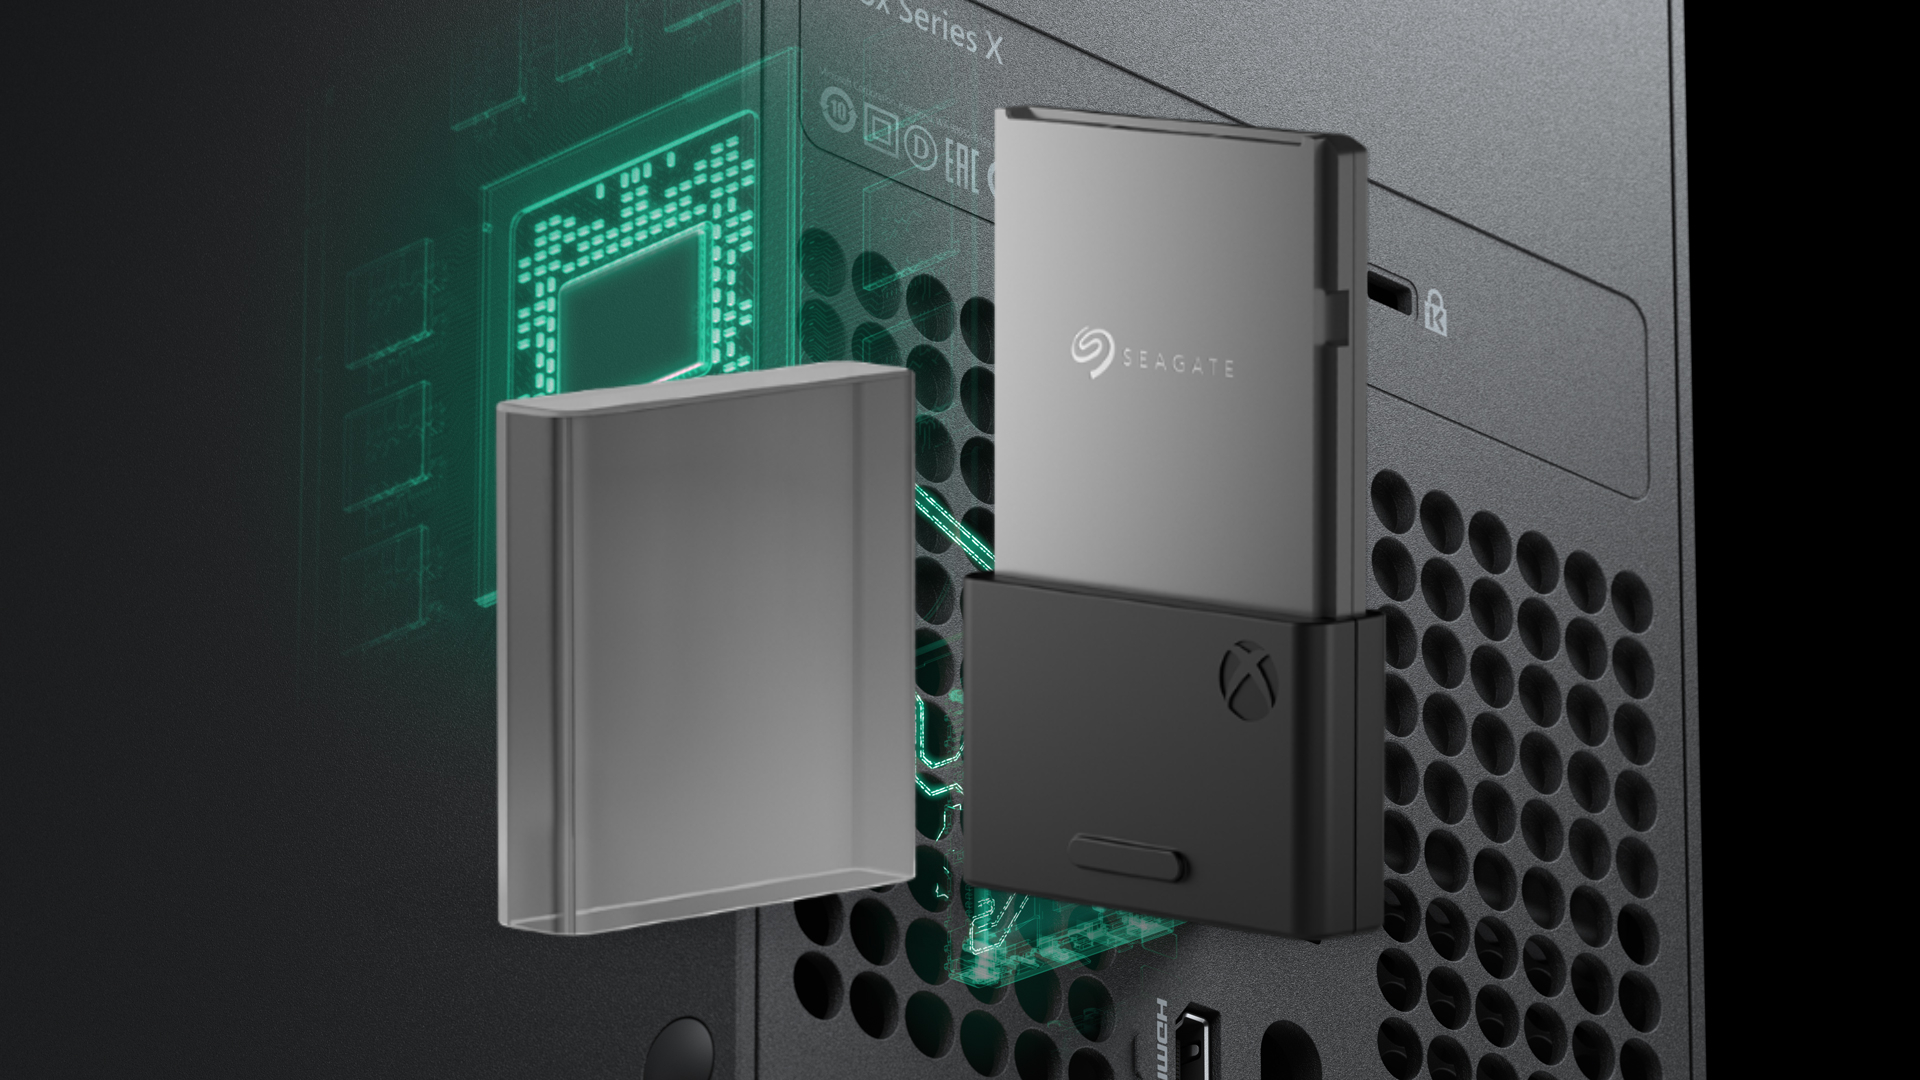 XboxSeriesX_Storage_HEROjg